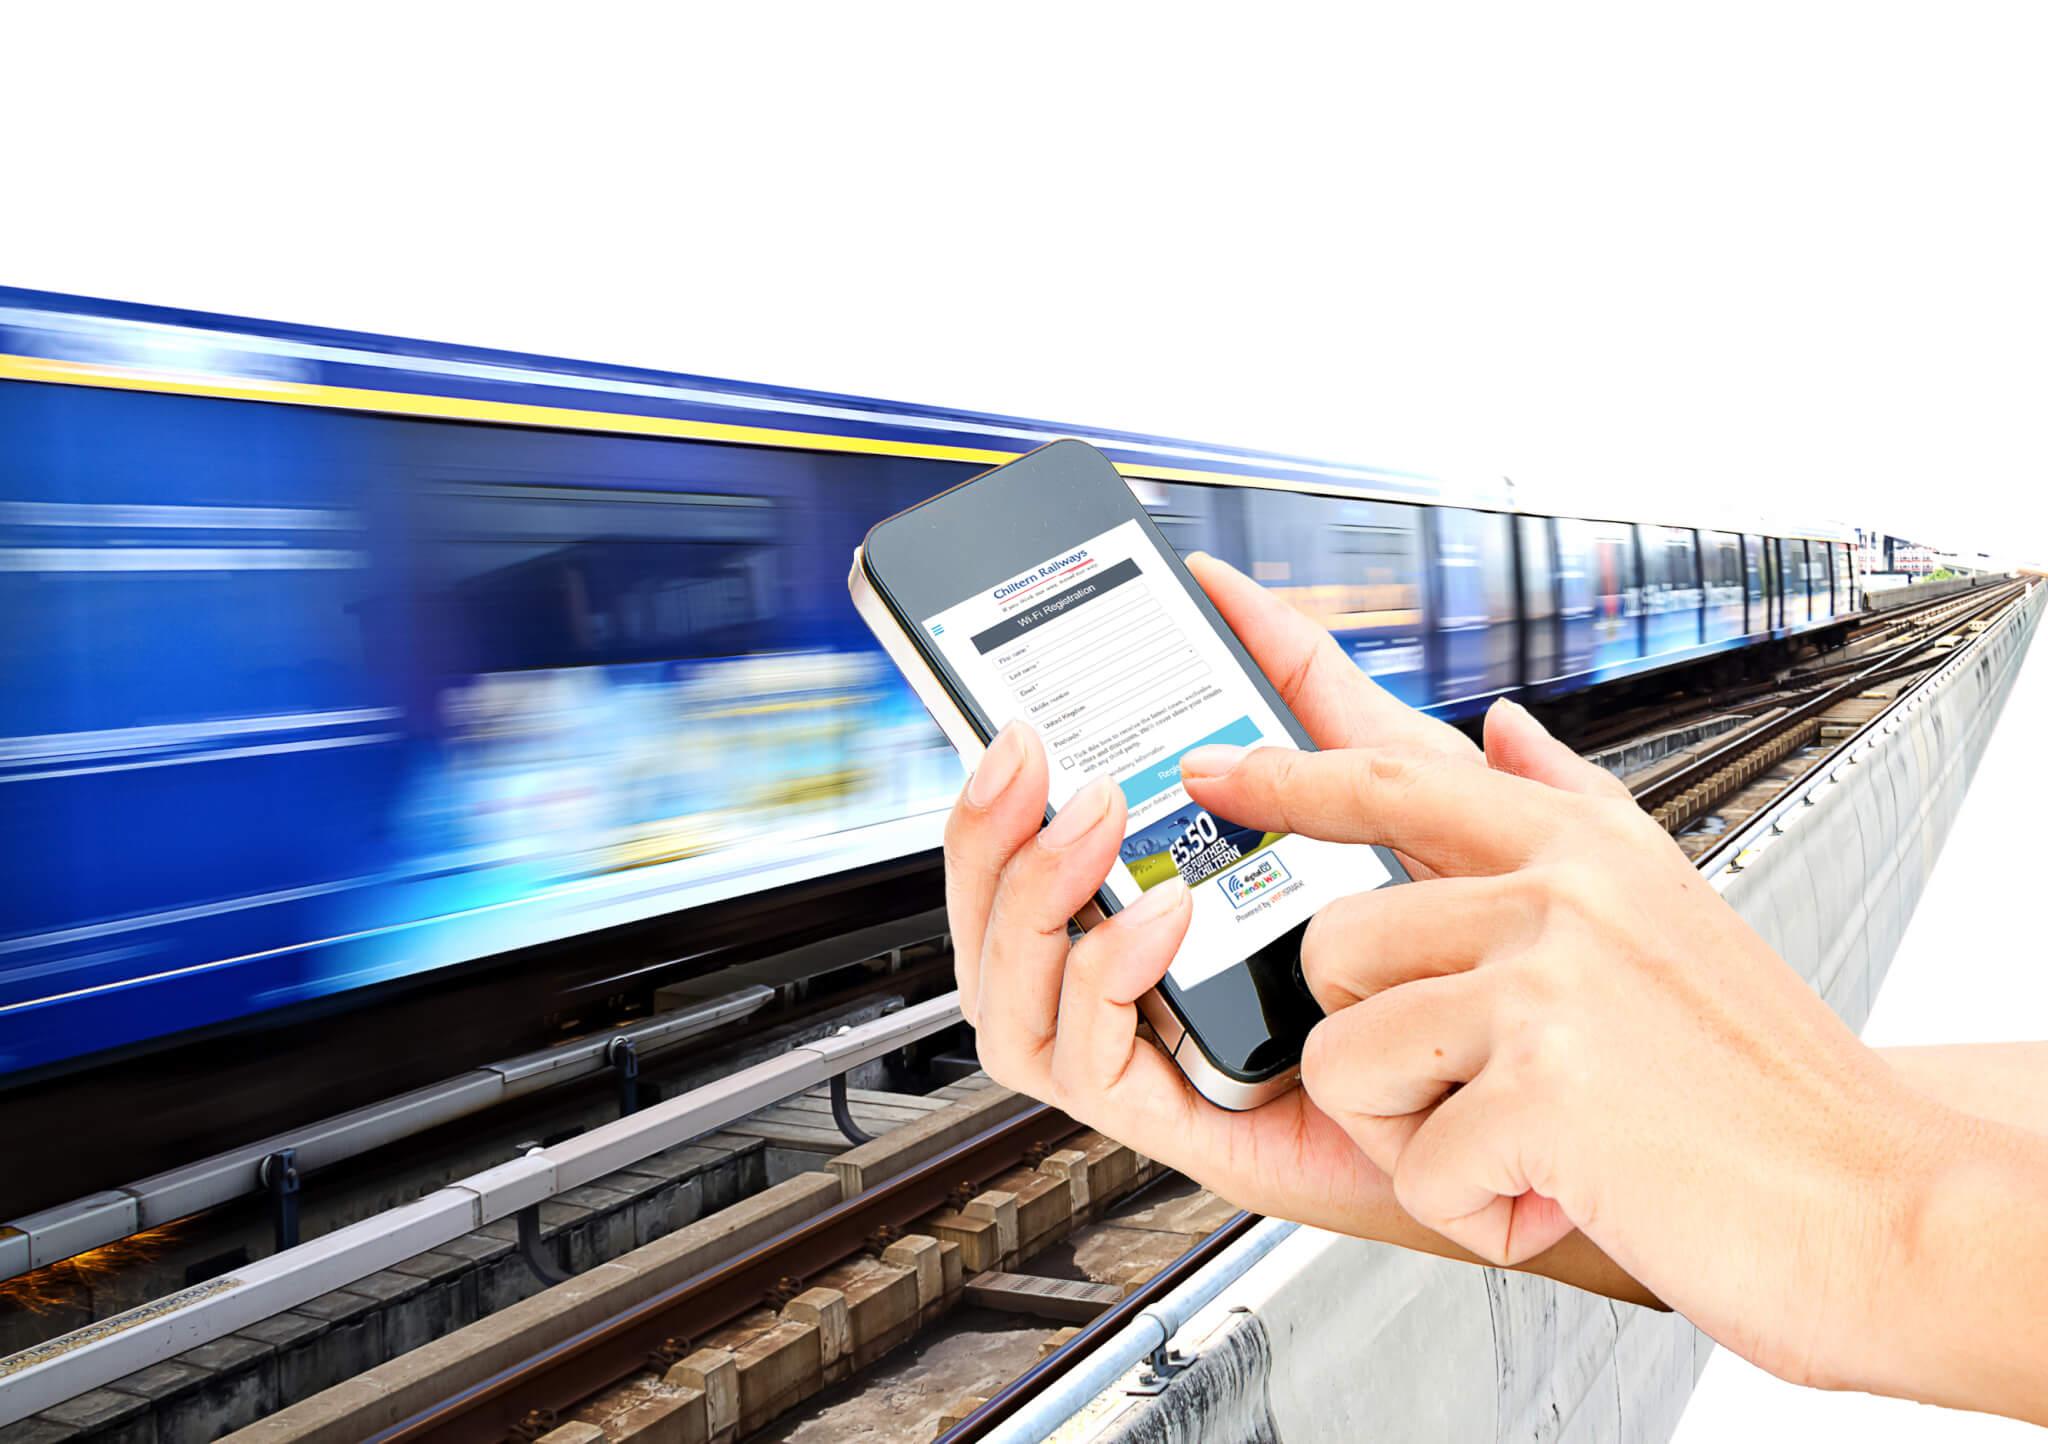 Passenger WiFi on Stations